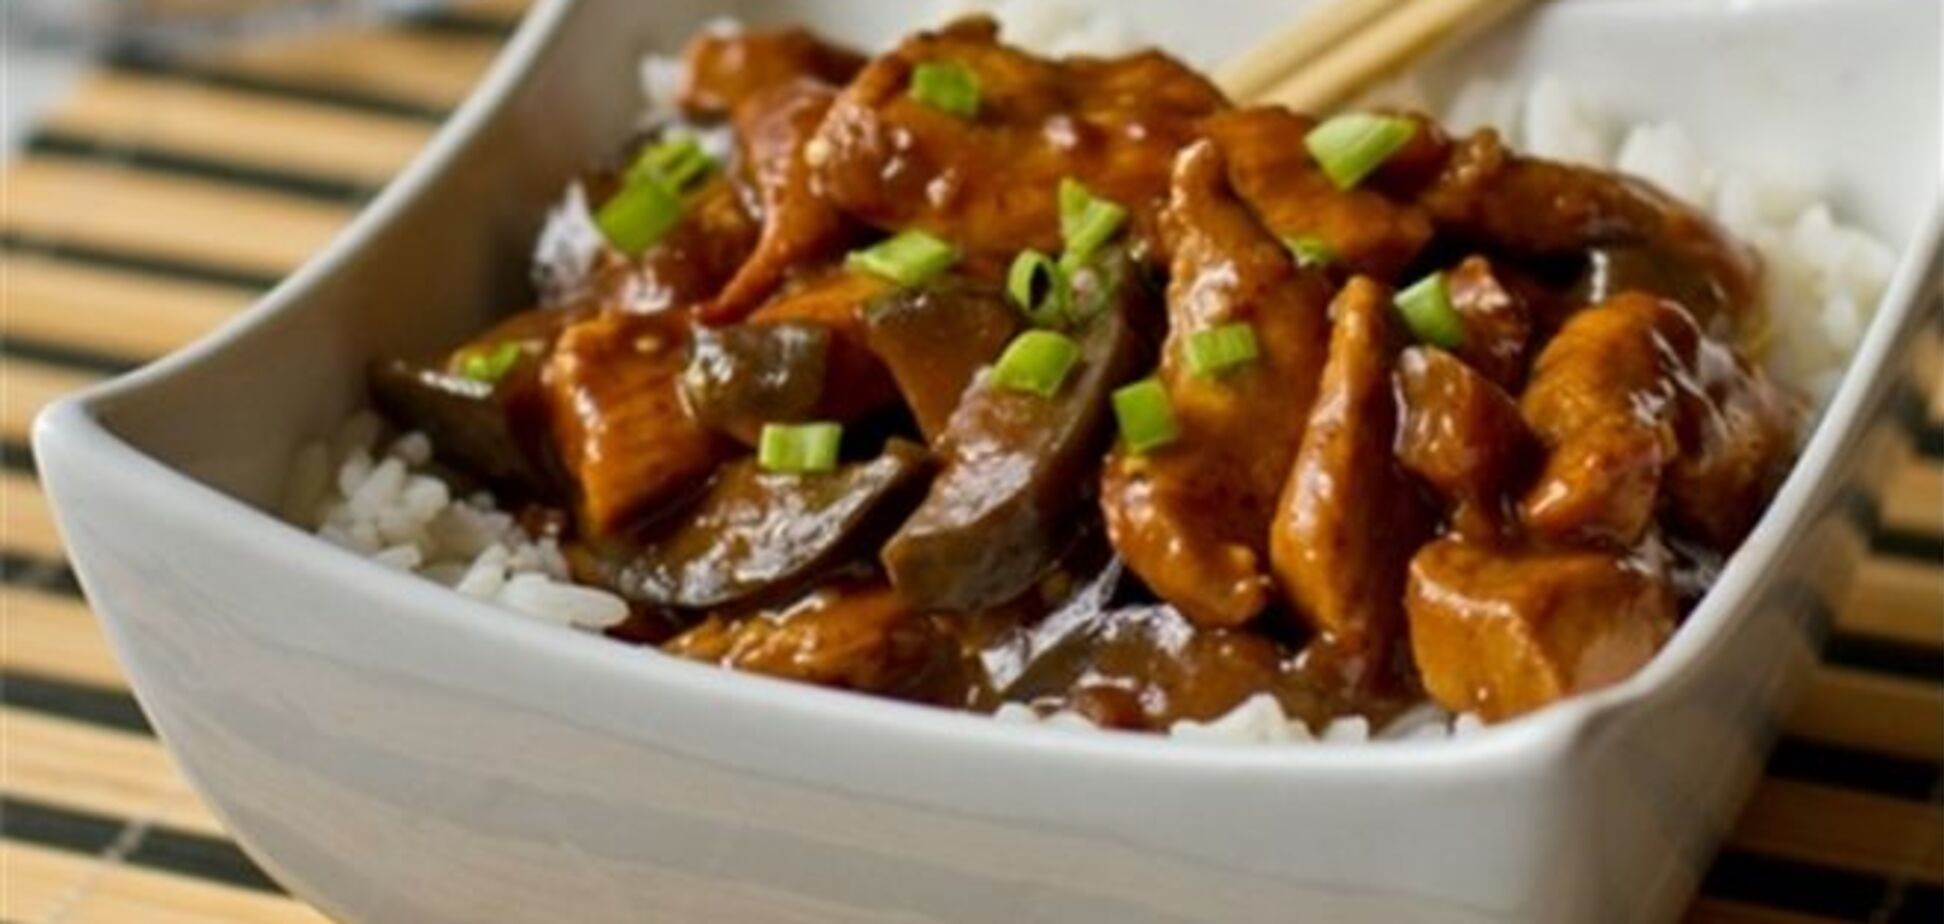 Курица с баклажанами по-китайски, 9 сентября 2013